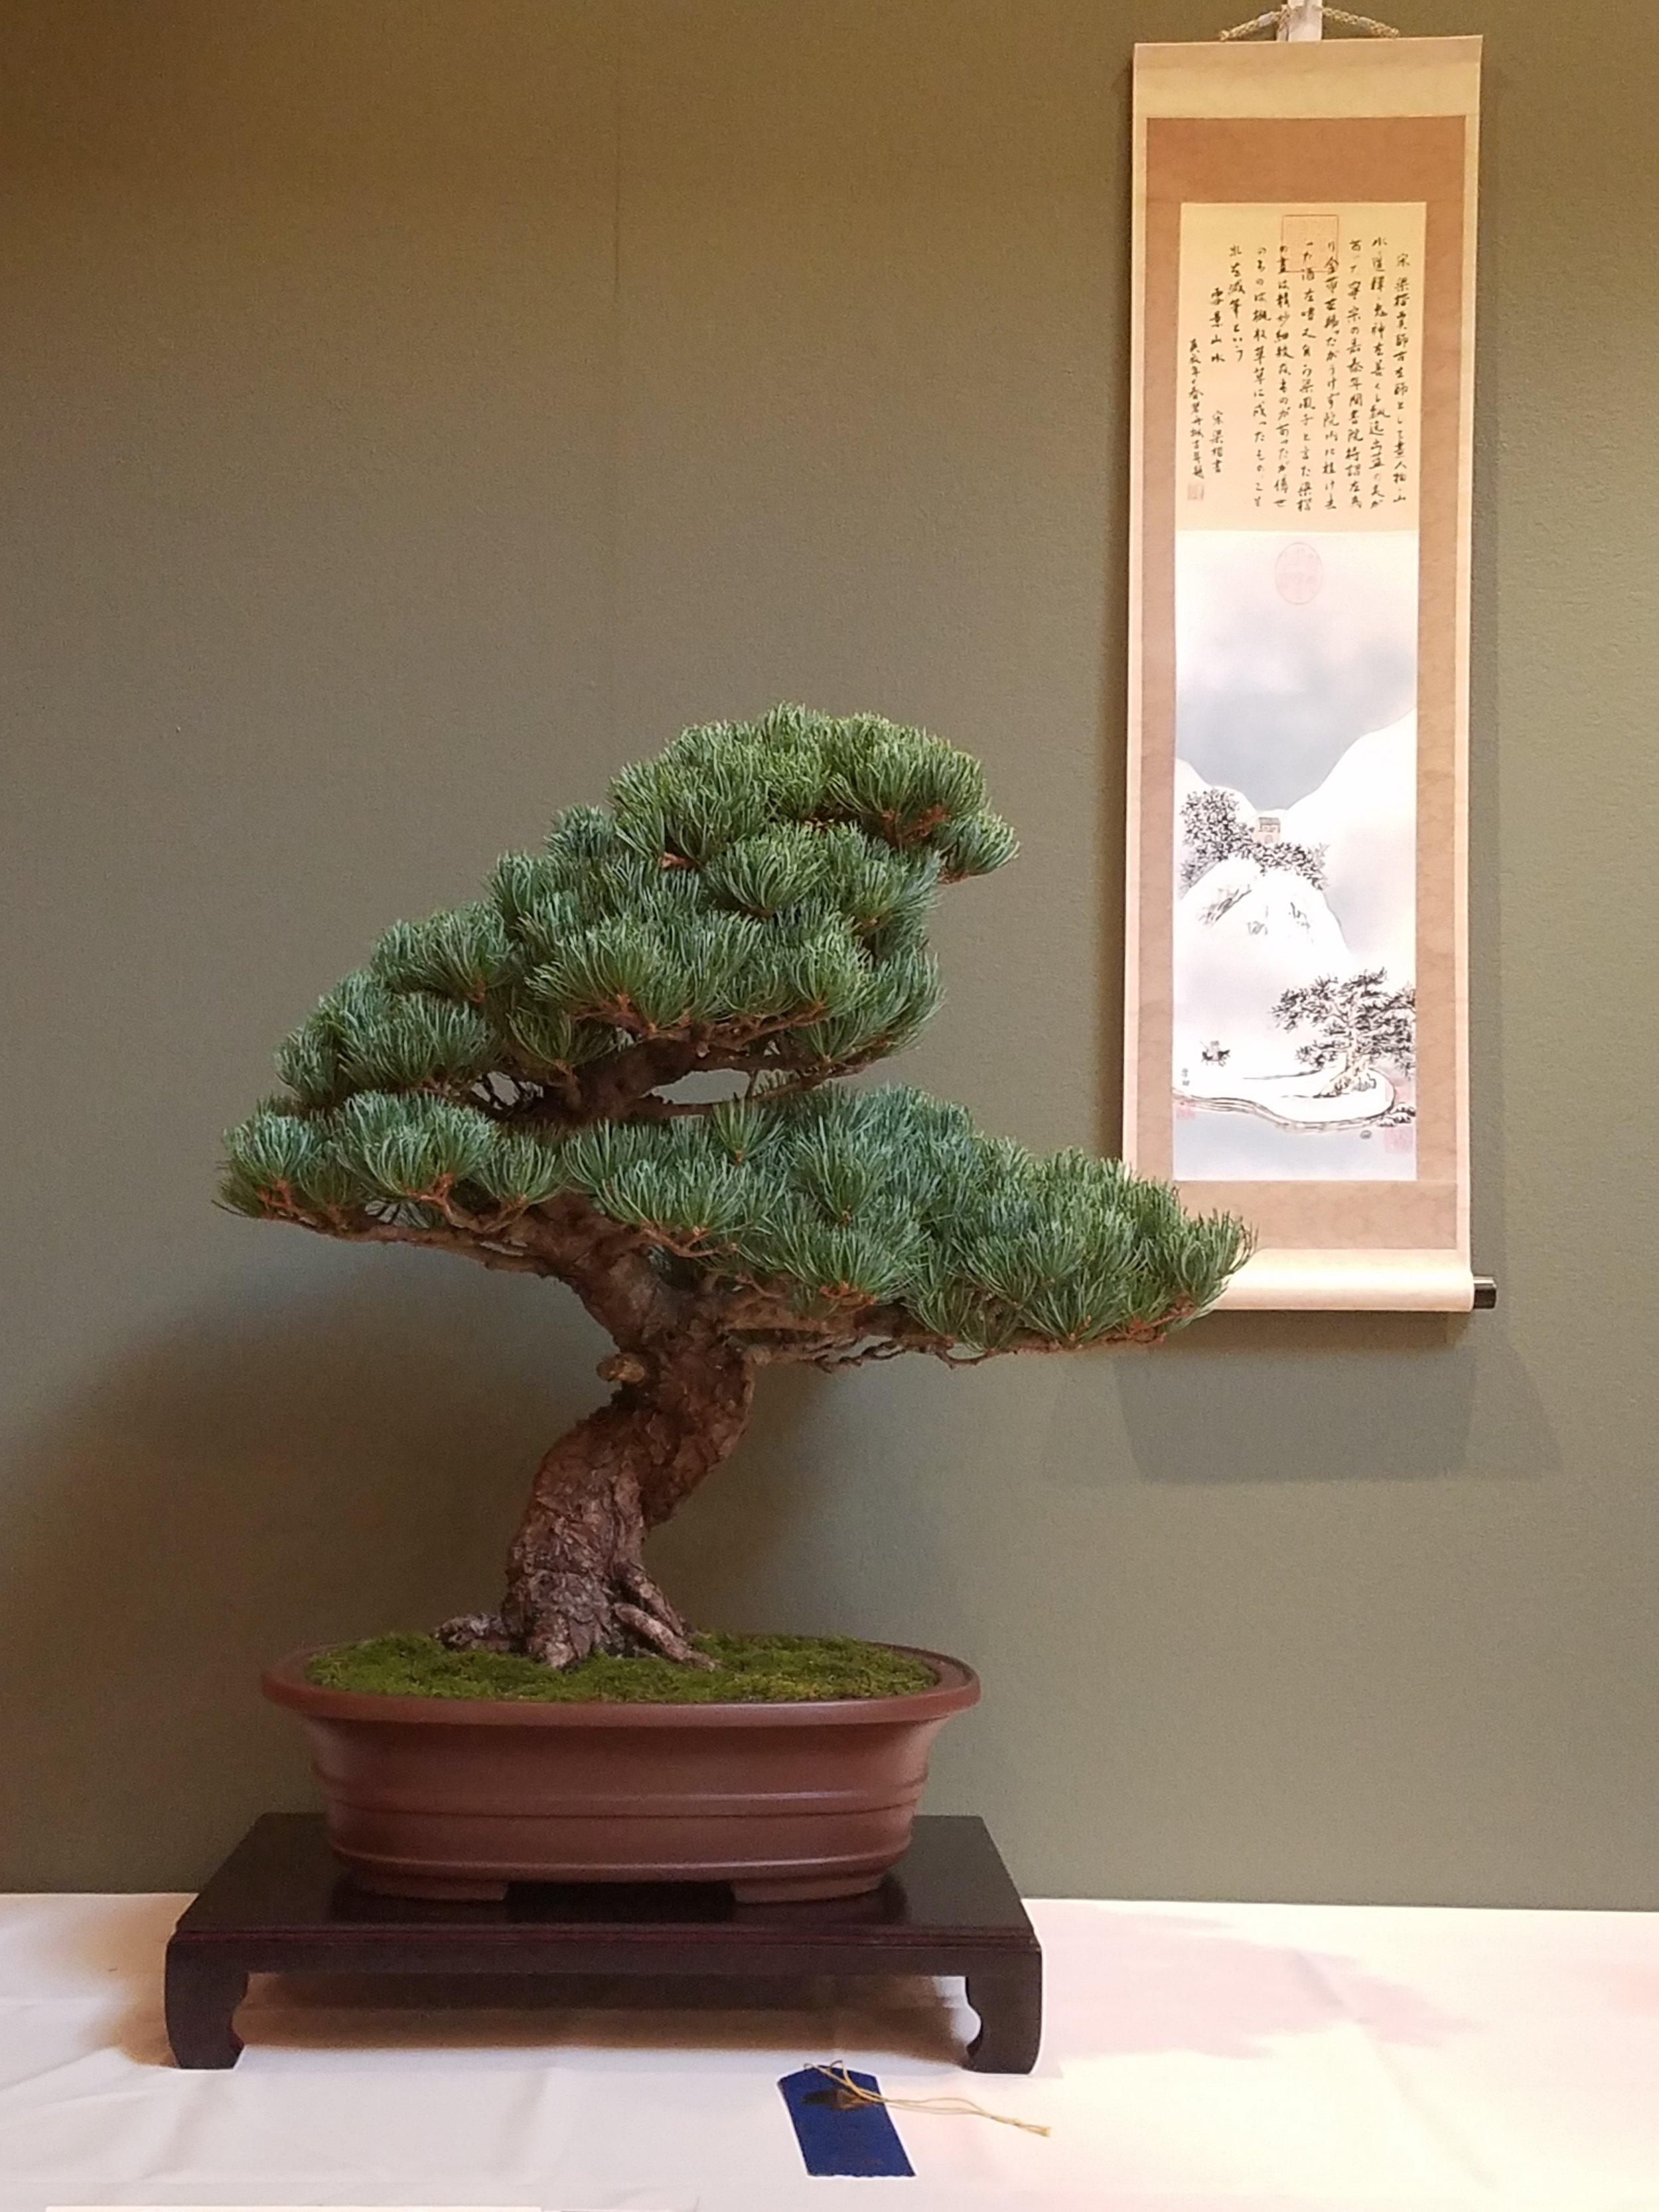 2017 Mid-America Bonsai Exhibition - Japanese White Pine - Informal Upright